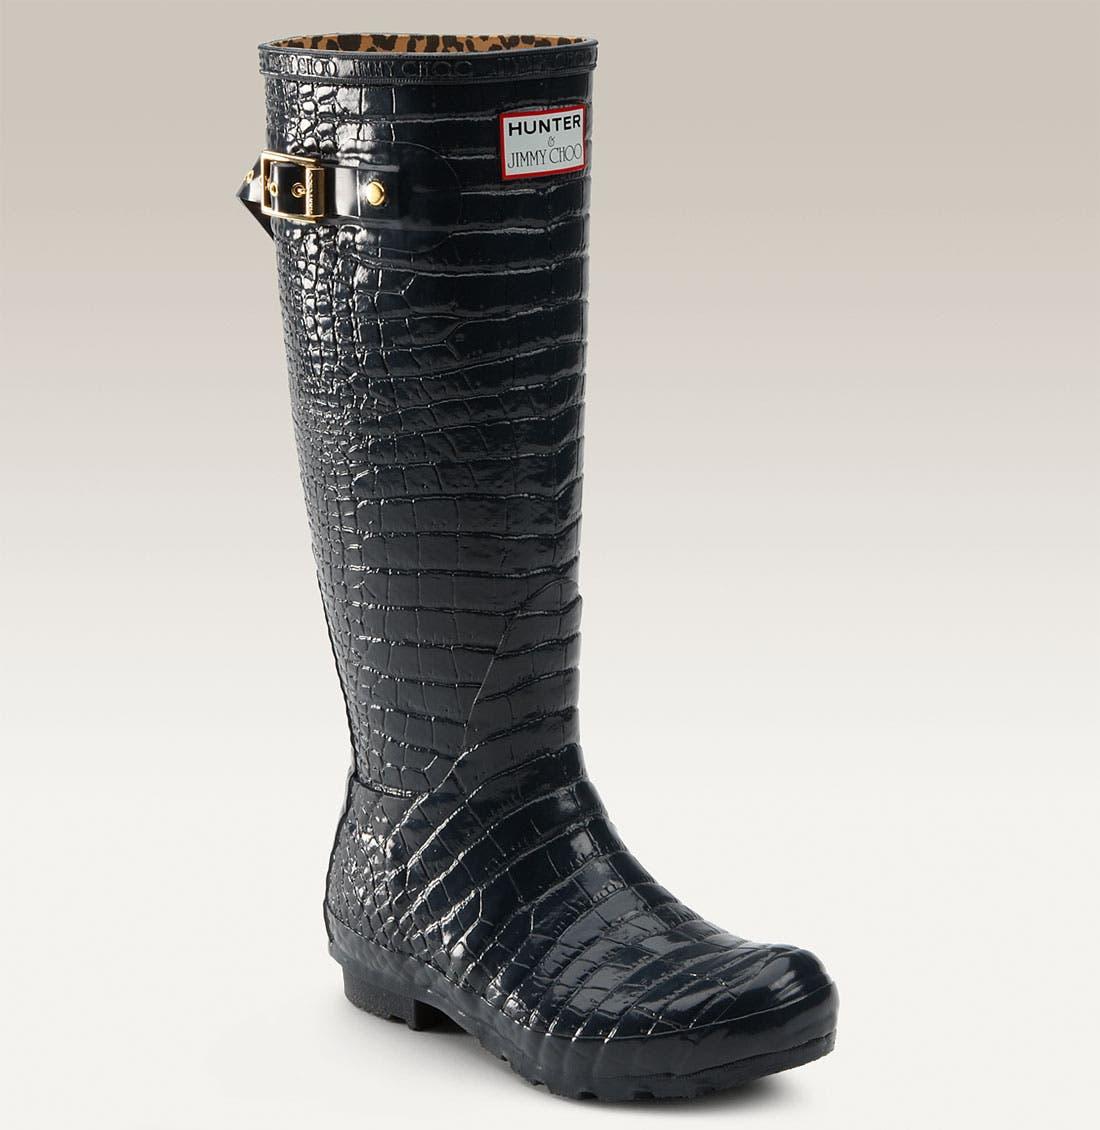 Alternate Image 1 Selected - Jimmy Choo 'Hunter' Rain Boot